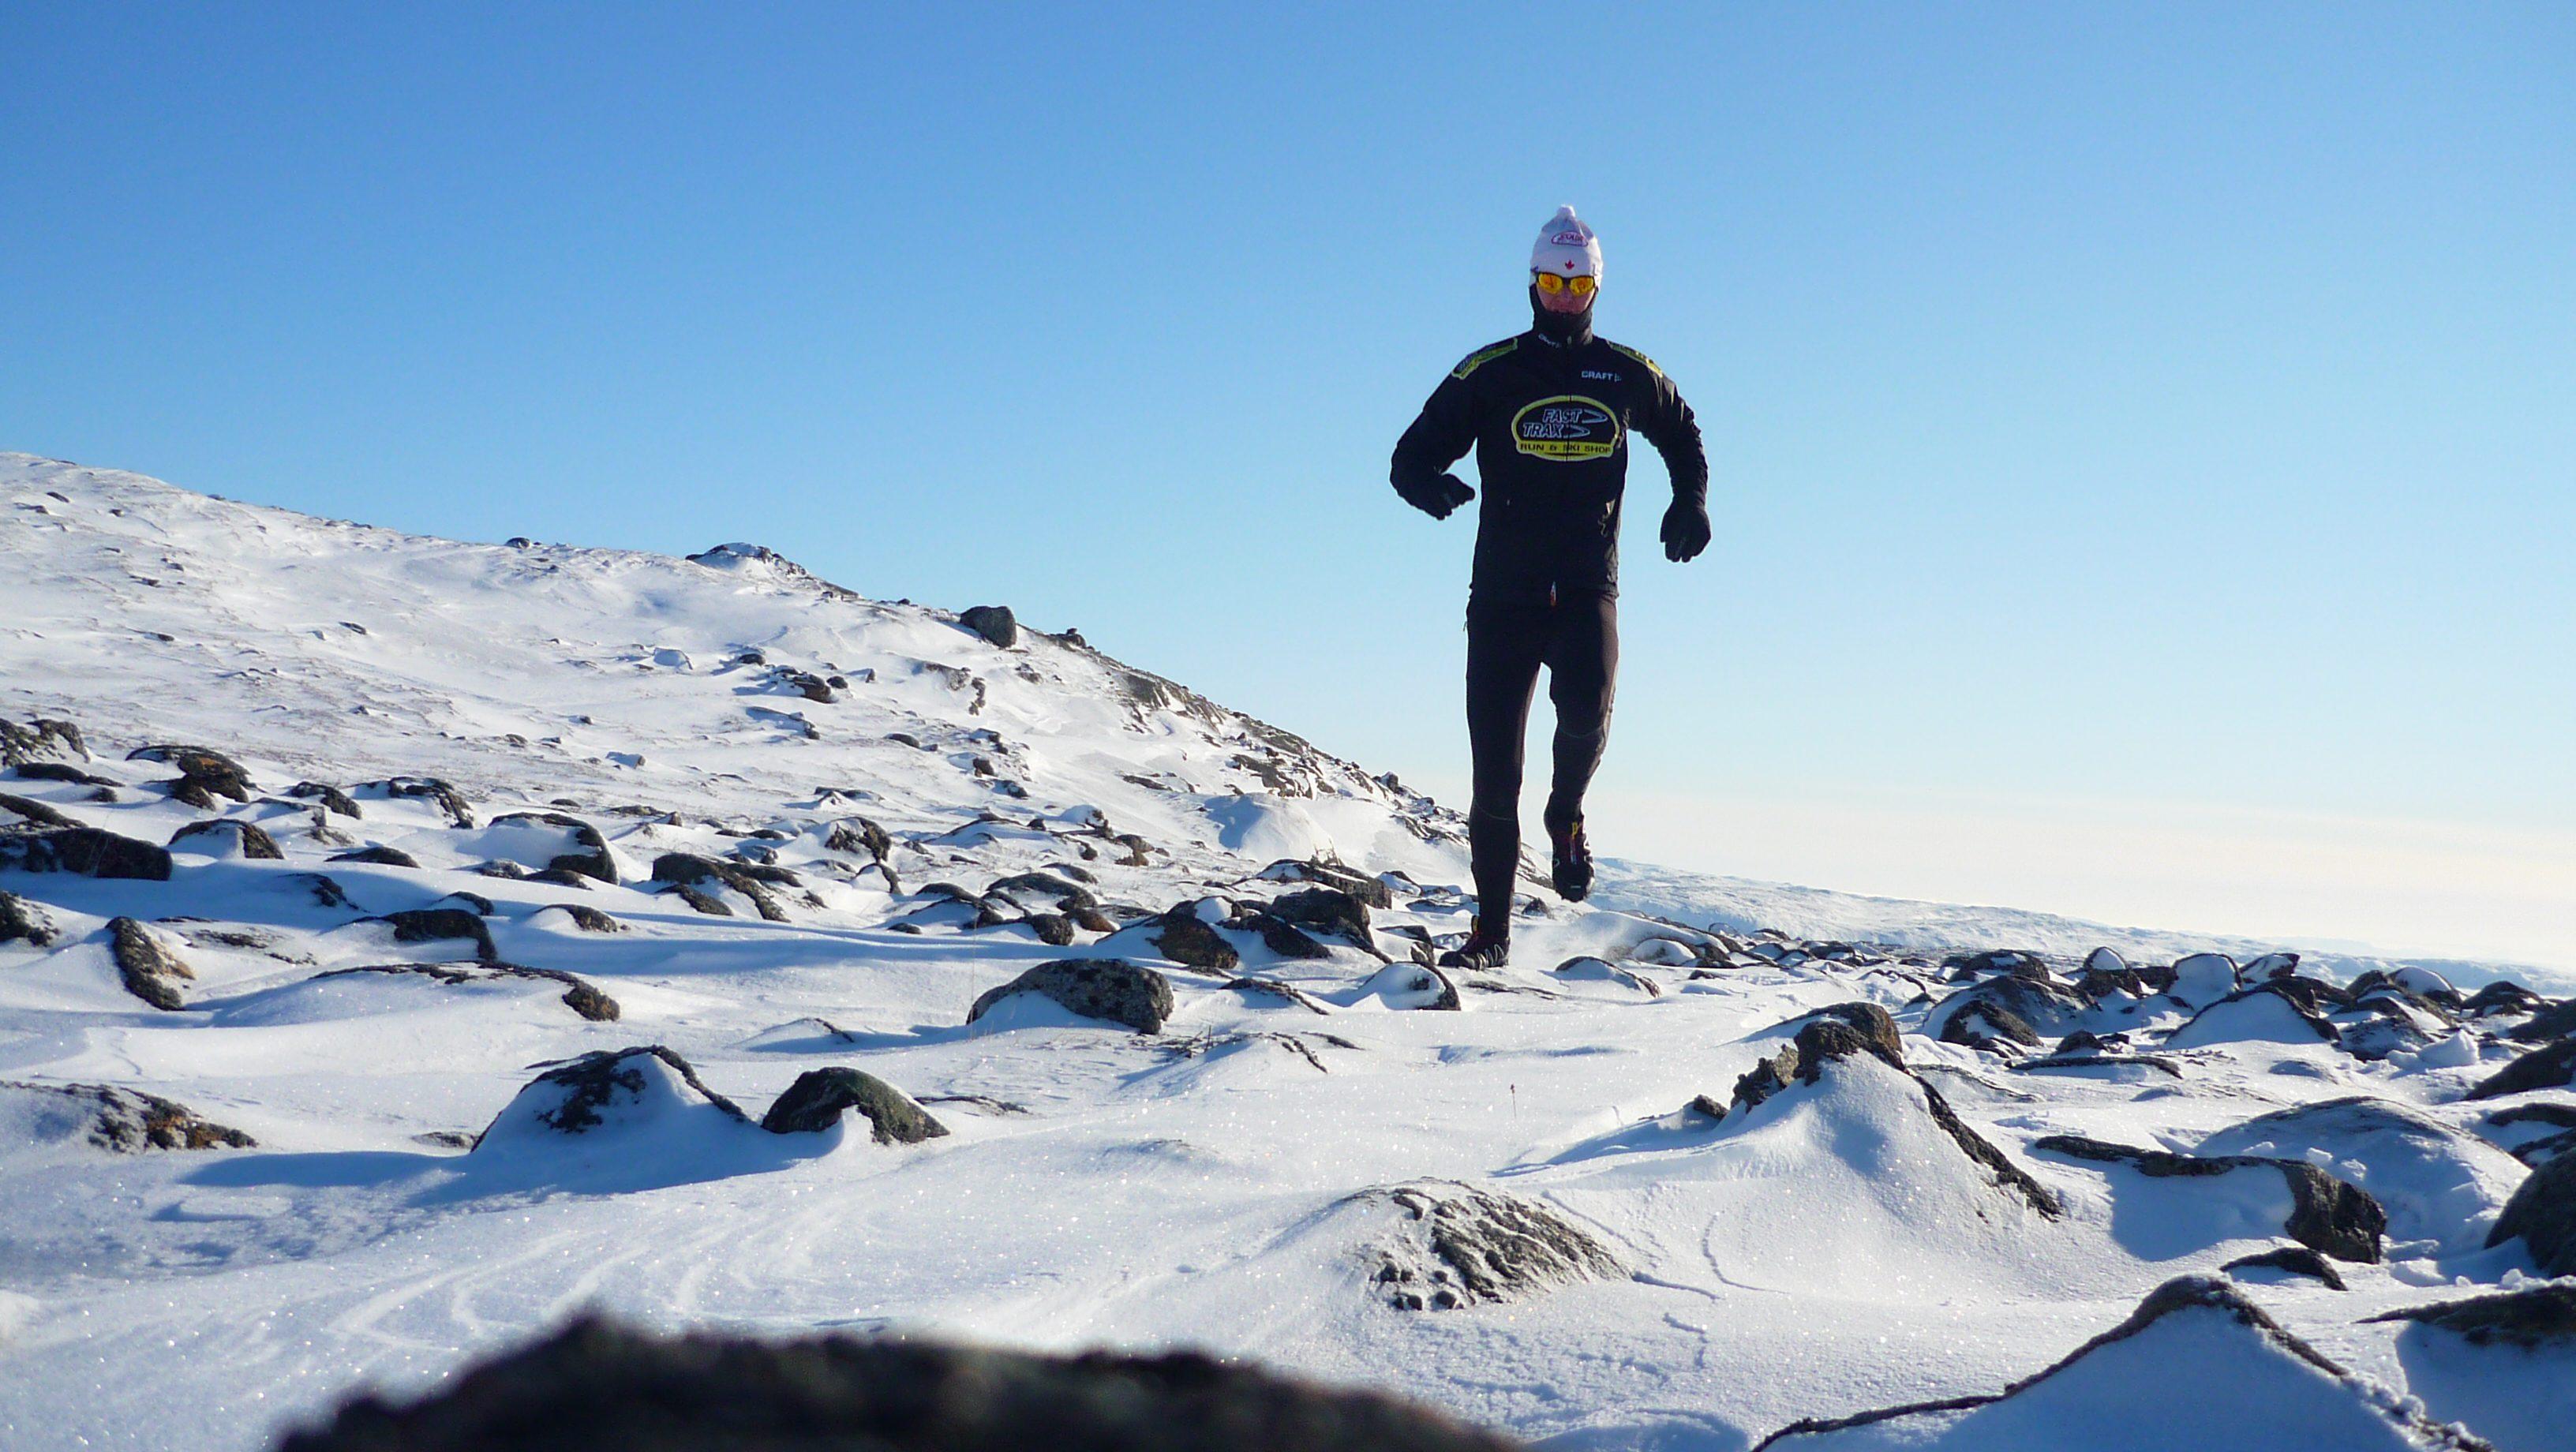 On the run in... Iqaluit, Nunavut - Canadian Running Magazine